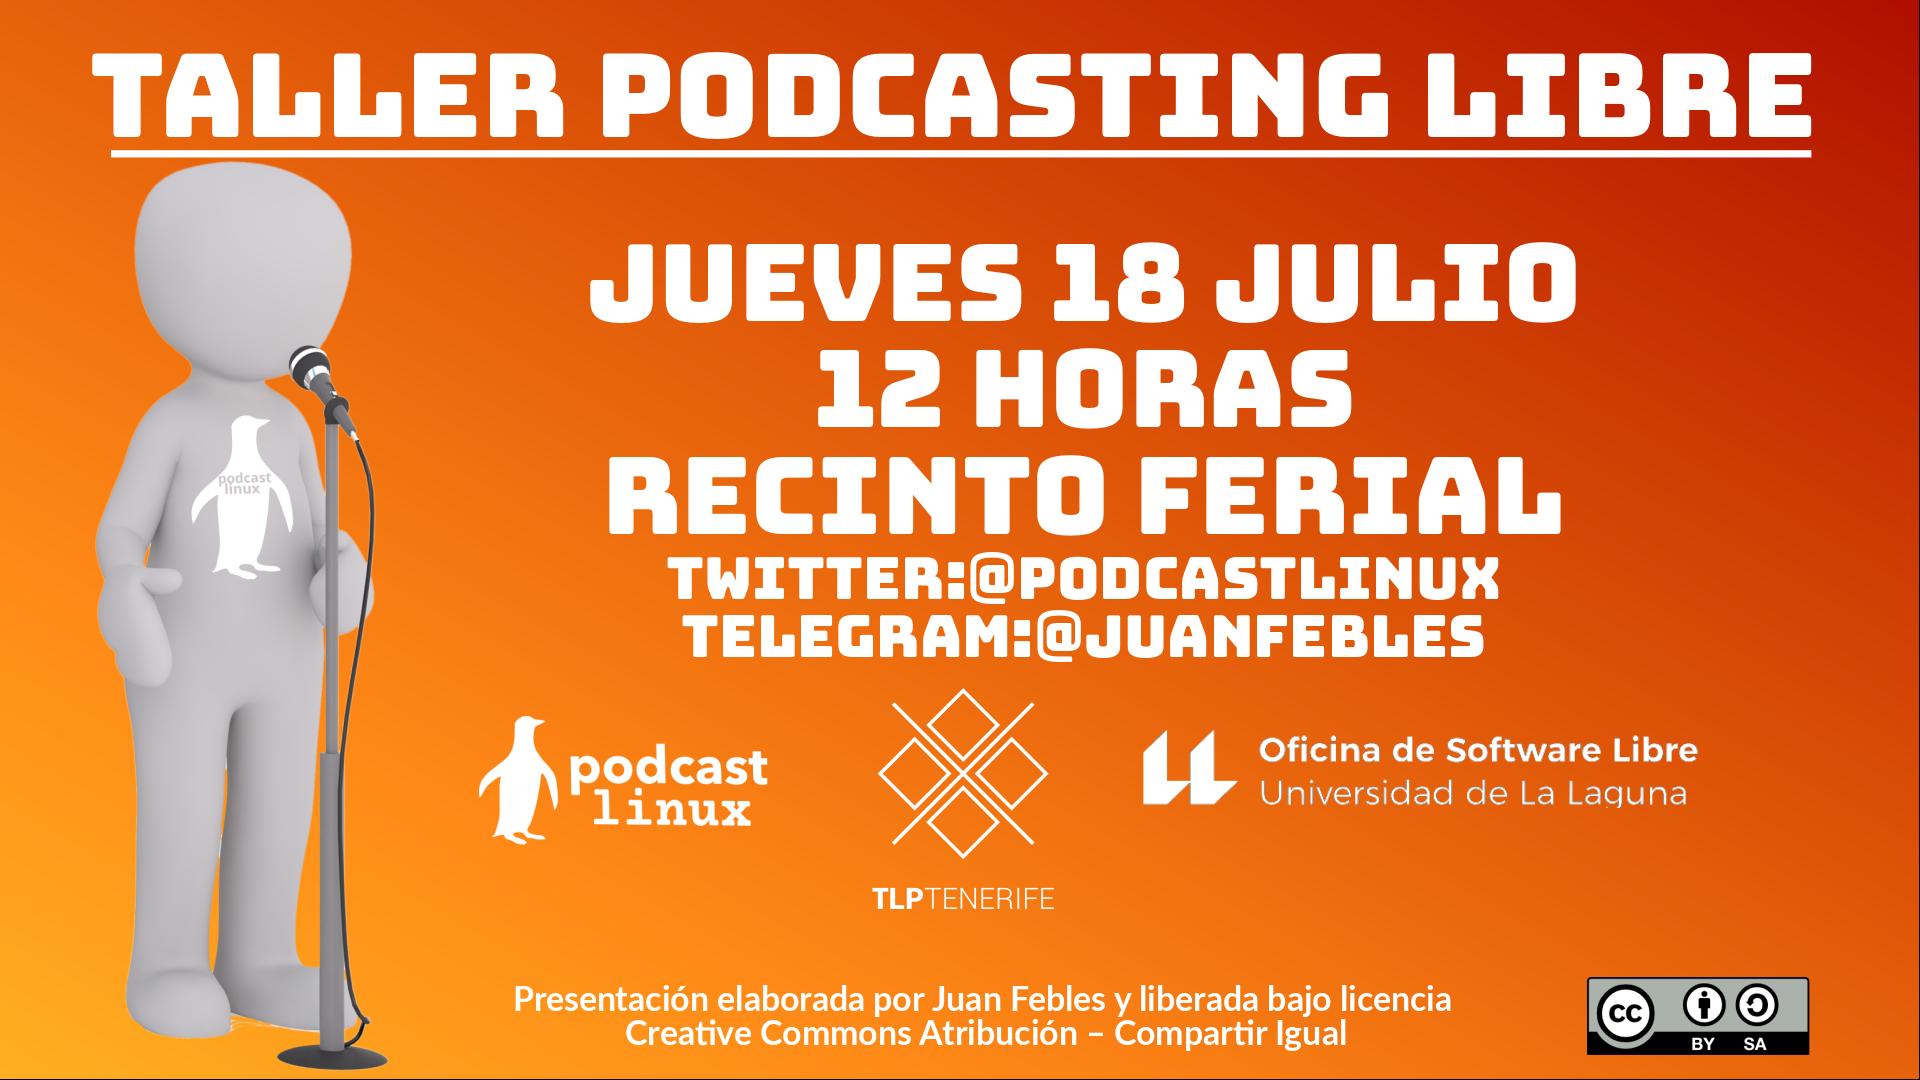 Taller Podcasting Libre 2019